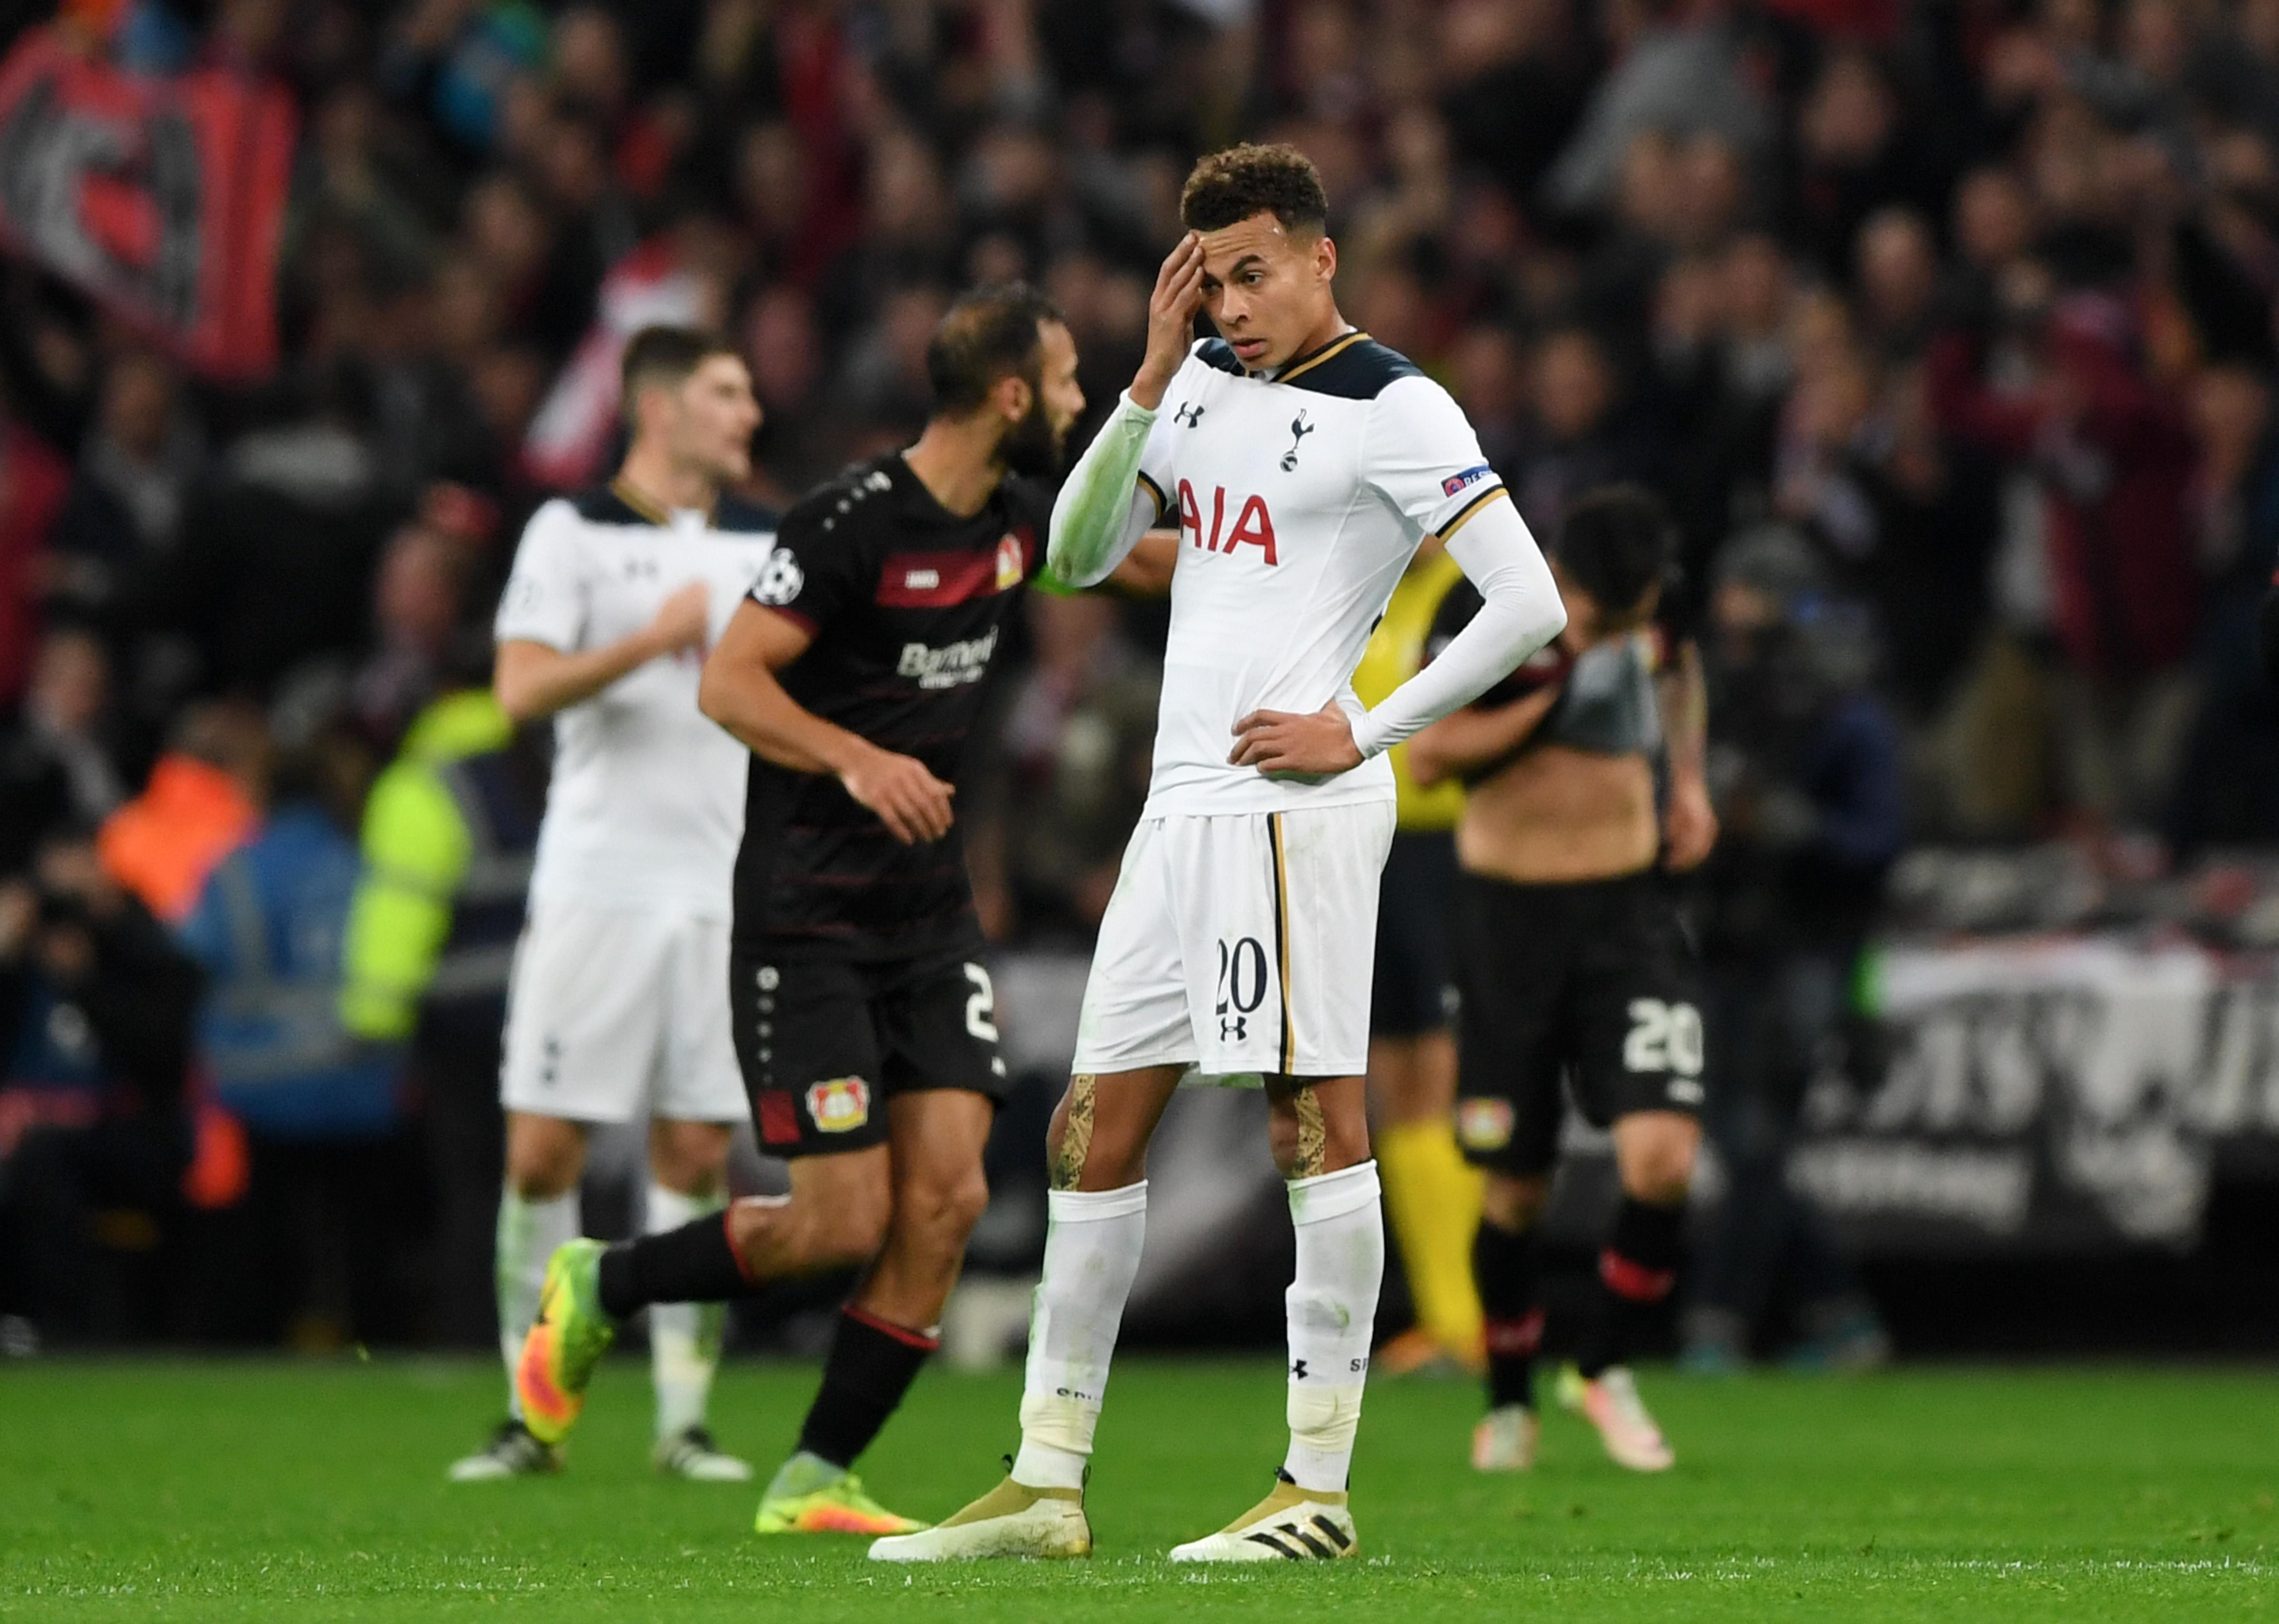 Tottenham Hotspur FC v Bayer 04 Leverkusen - UEFA Champions League